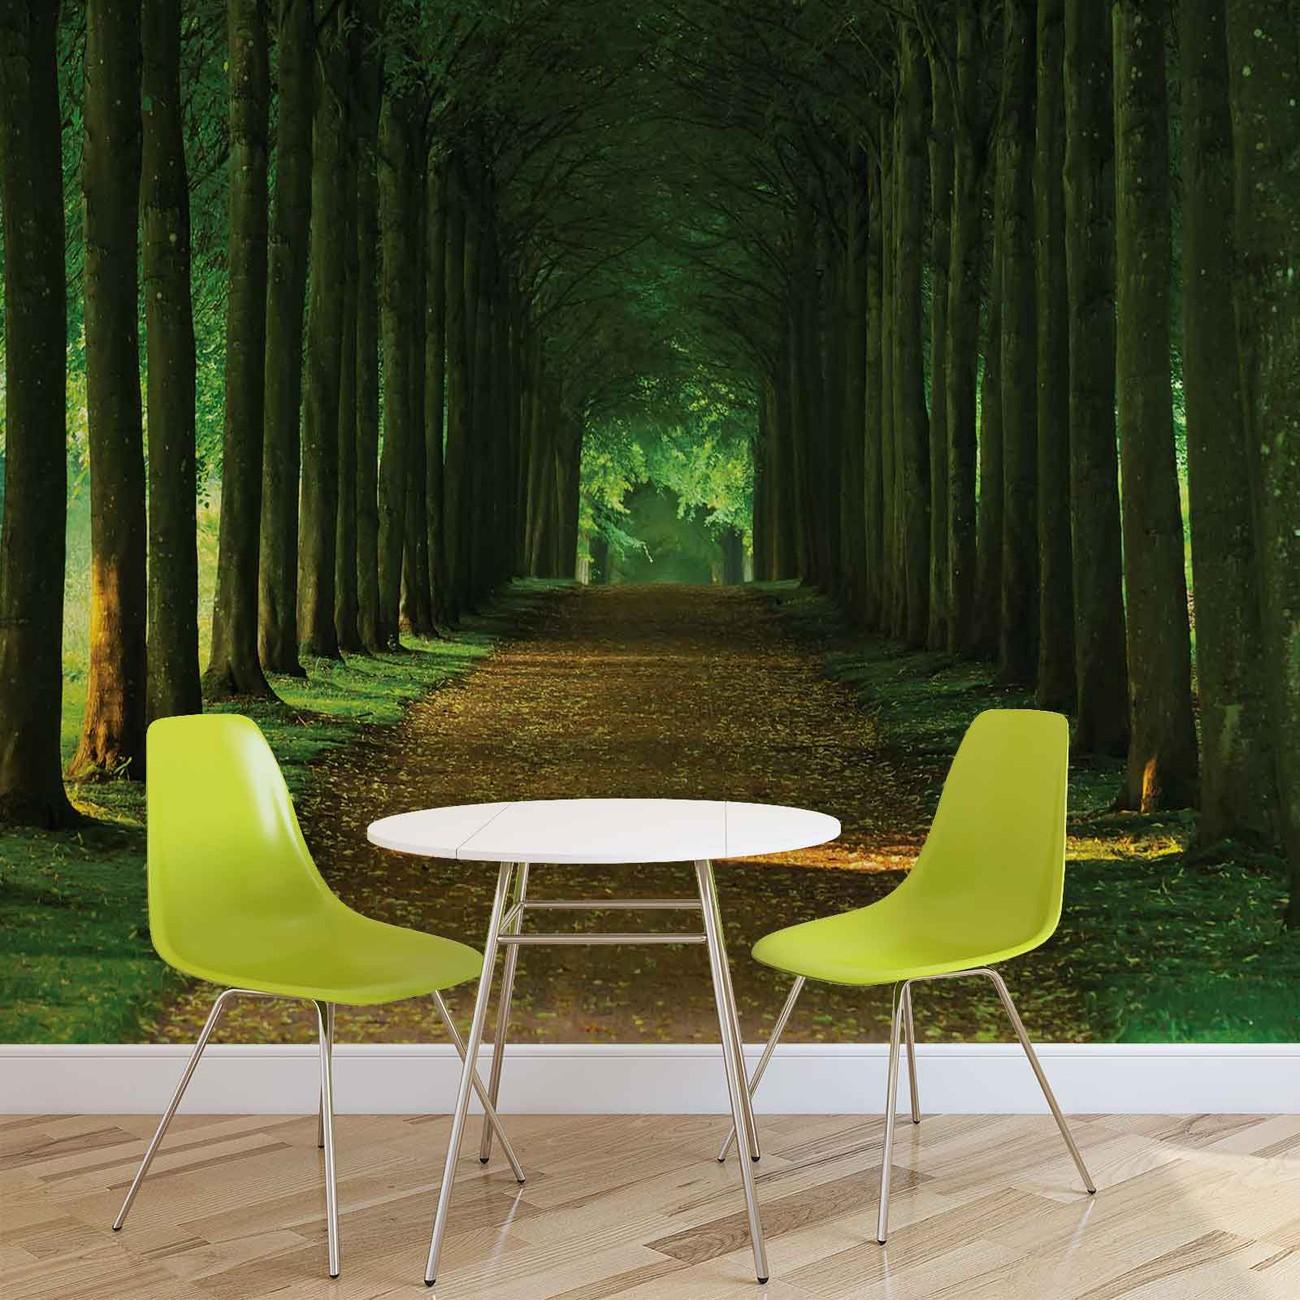 fototapete tapete weg b ume wald natur bei europosters kostenloser versand. Black Bedroom Furniture Sets. Home Design Ideas